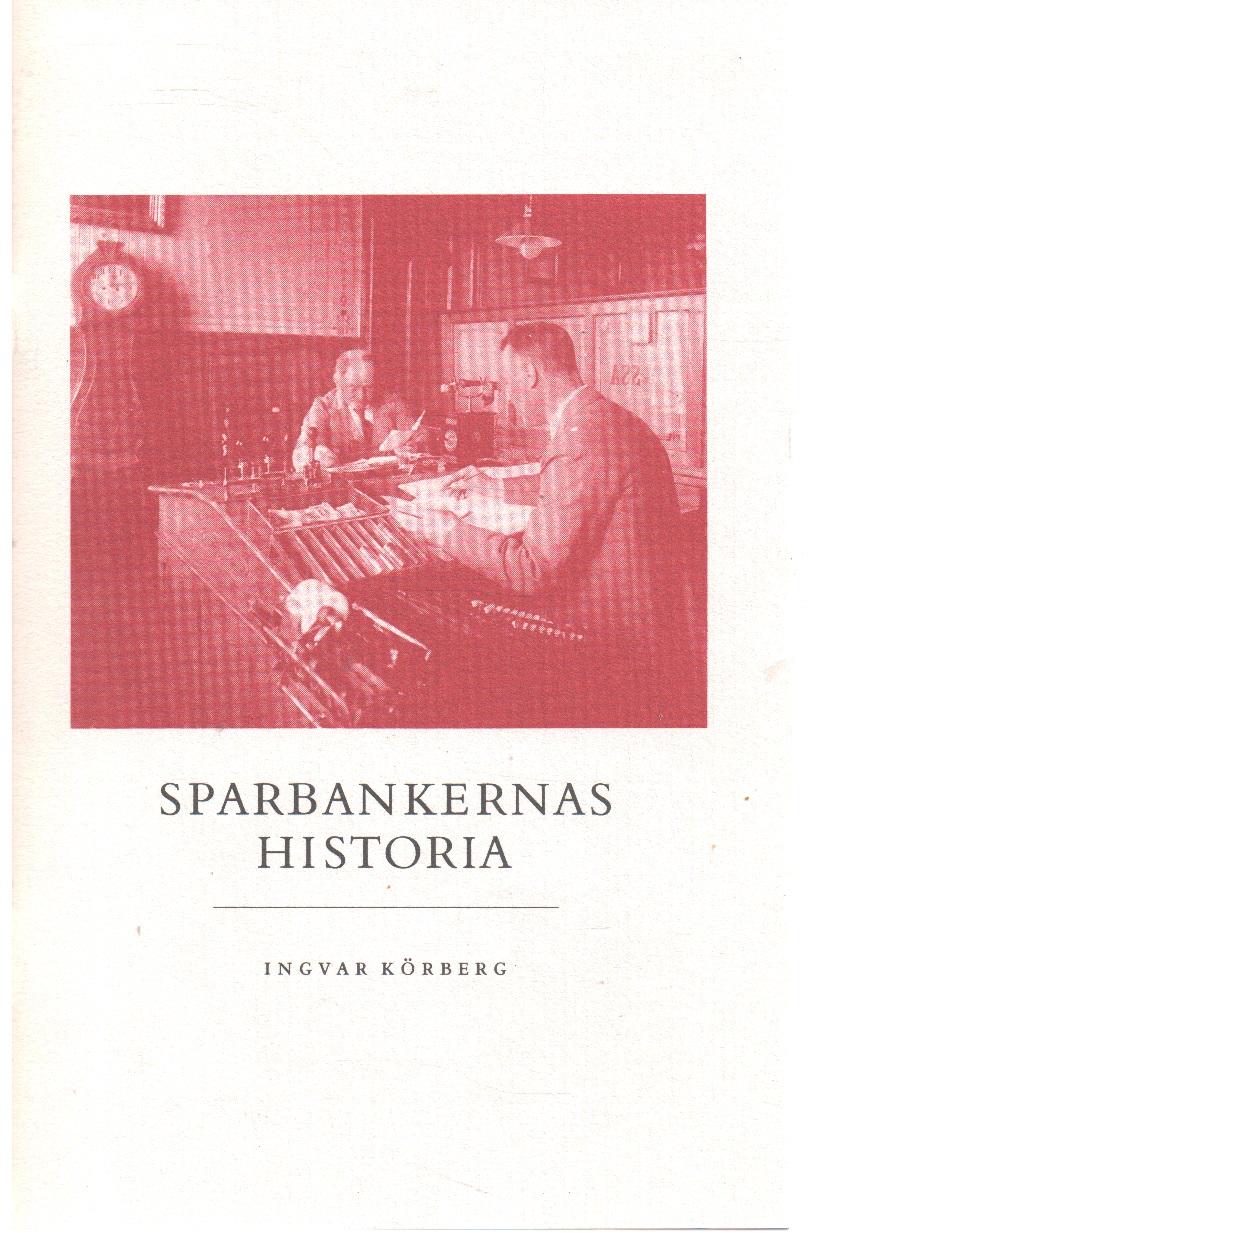 Sparbankernas historia - Körberg, Ingvar